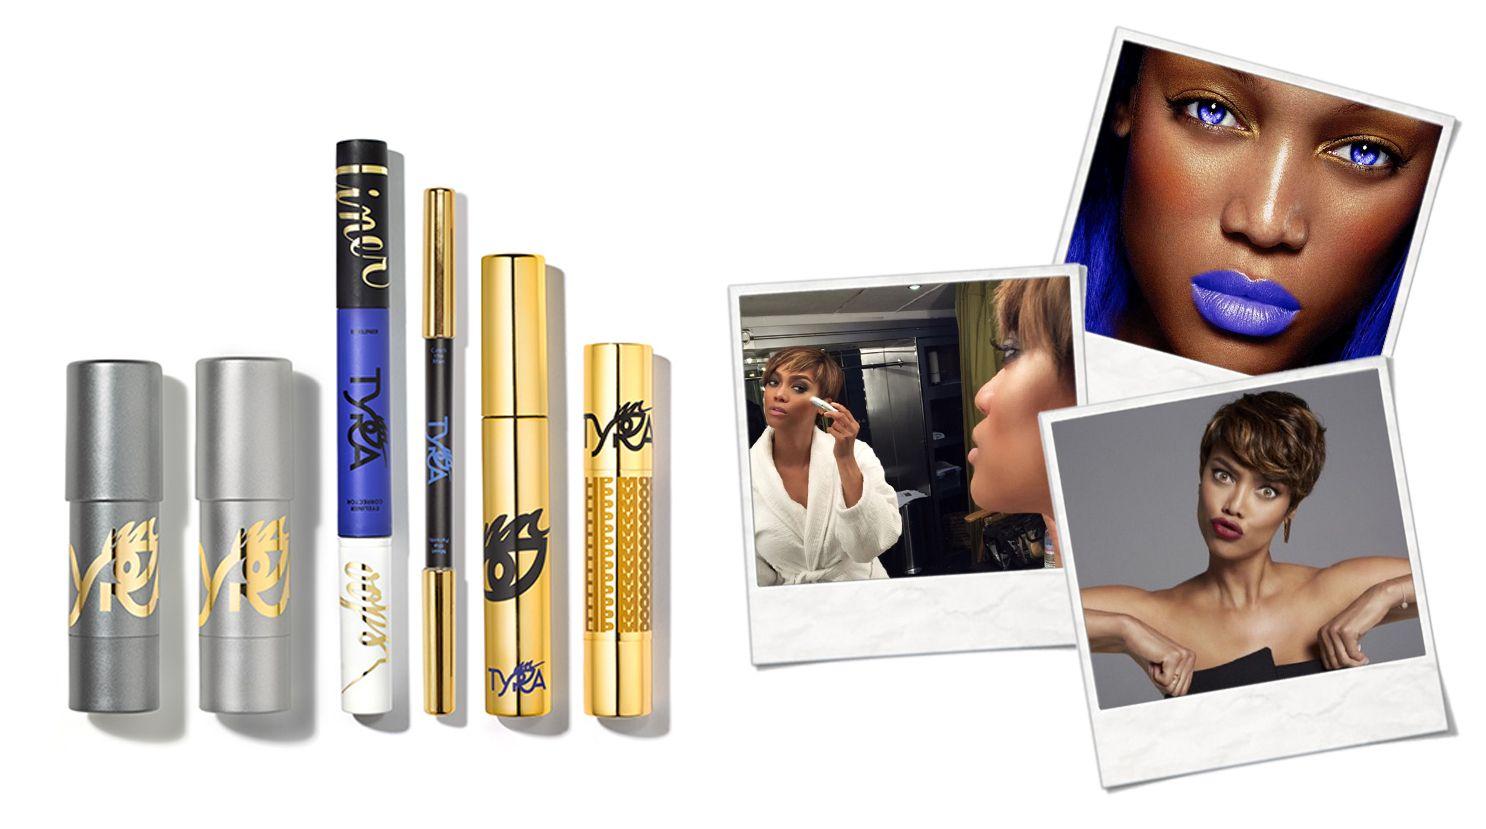 Tyra Banks new cosmetics line. TYRA BEAUTY! Check out my